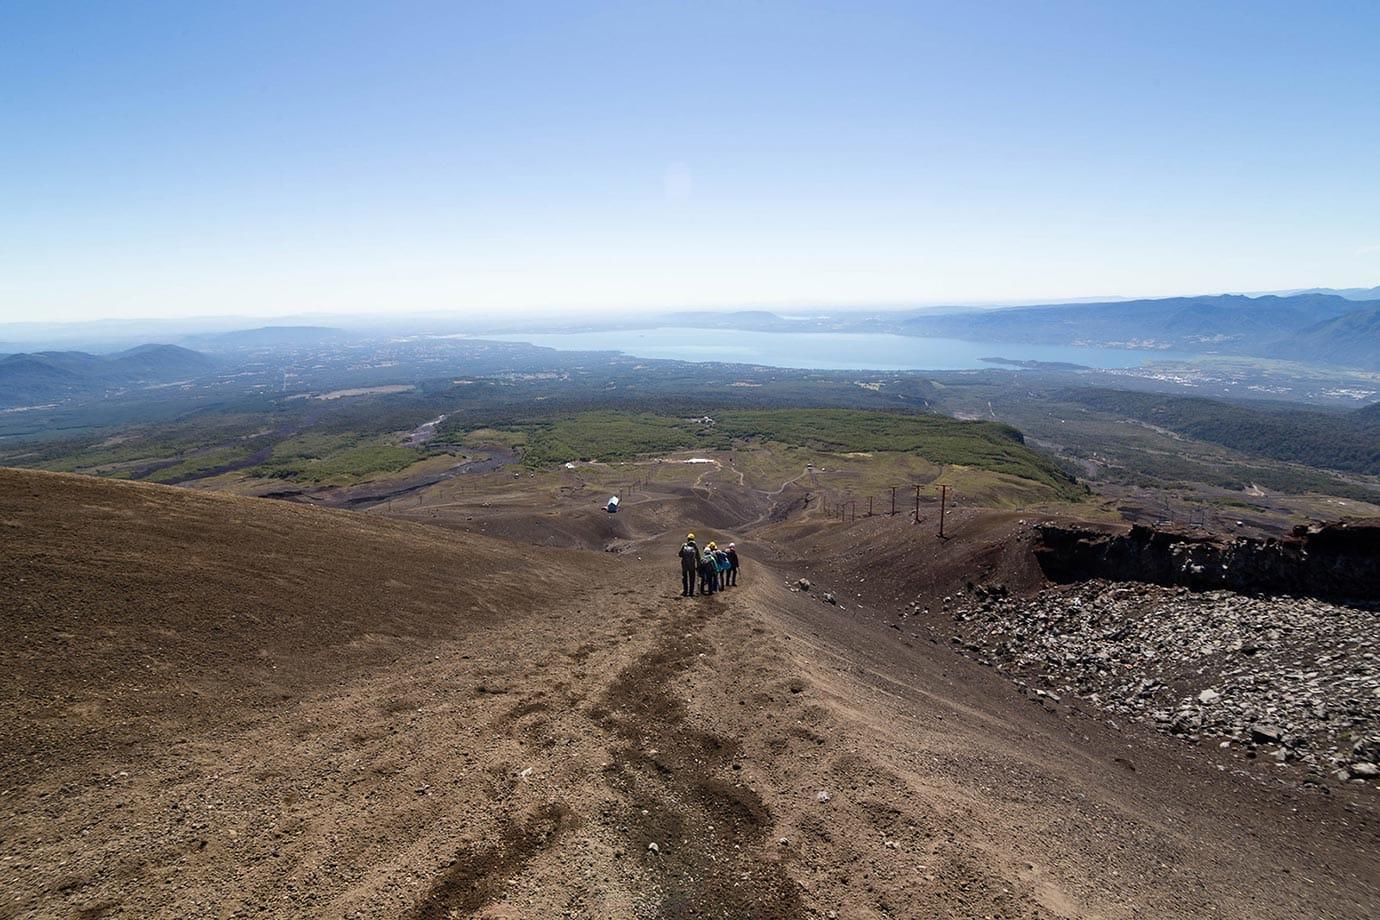 Climbing down Volcano Villarrica